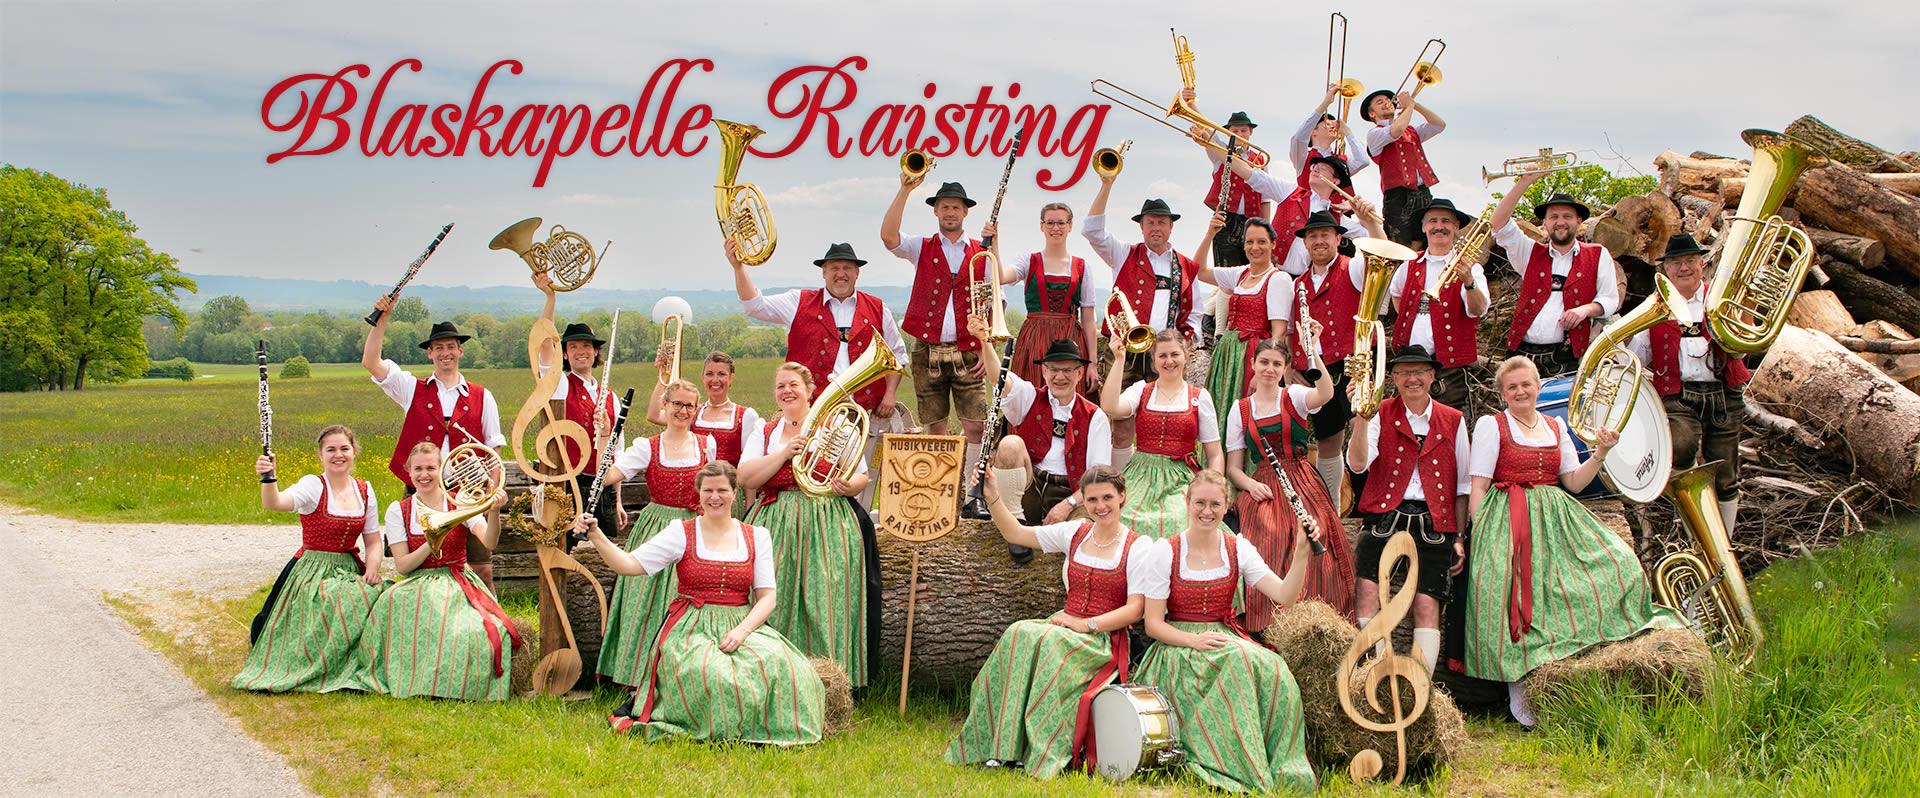 Blaskapelle Raisting Gruppenbild